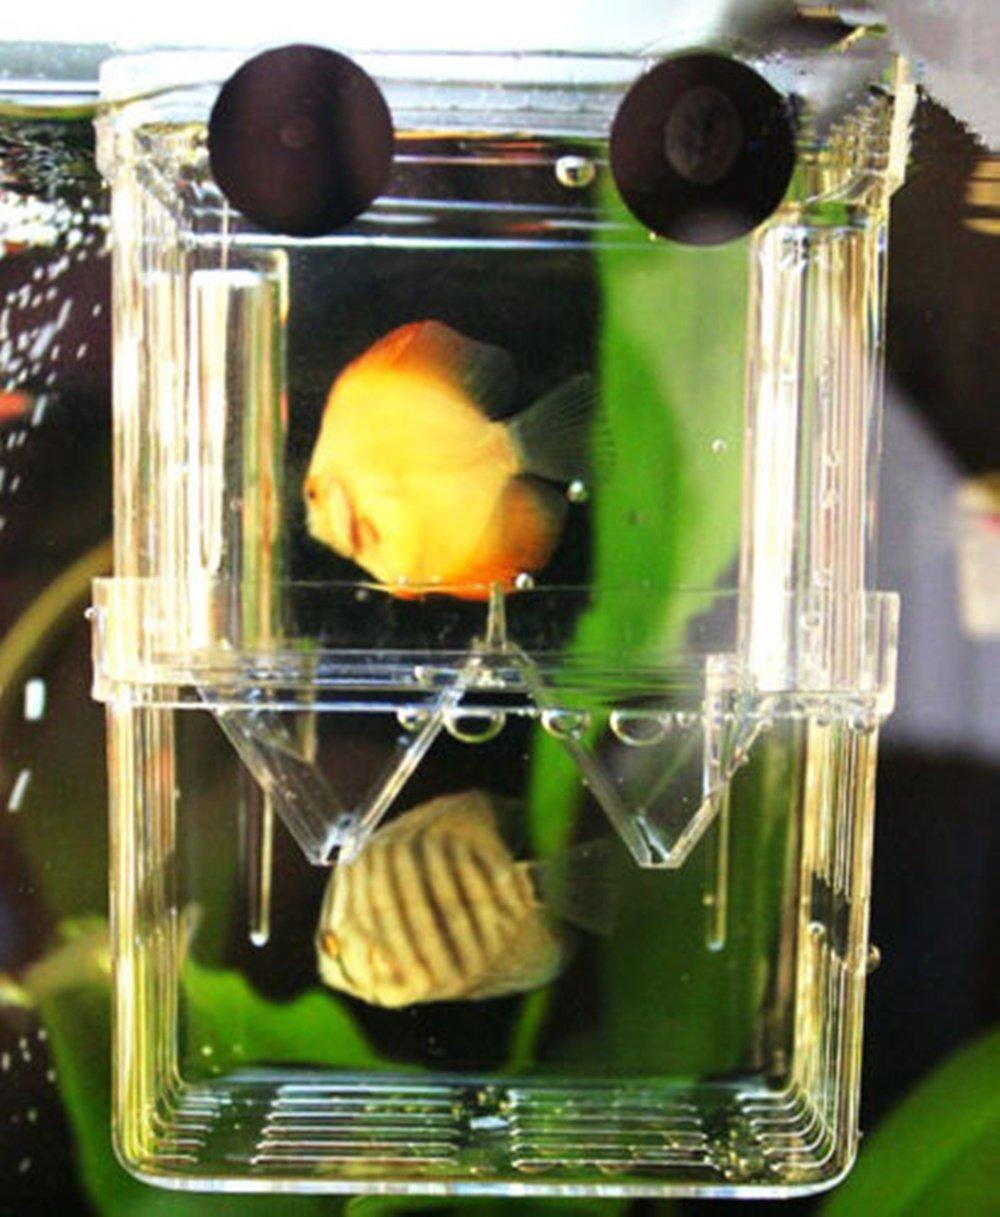 Aquarium Breeder Breeding Hatchery Tank Multi Functional Divider Spawning for Shrimp Fish